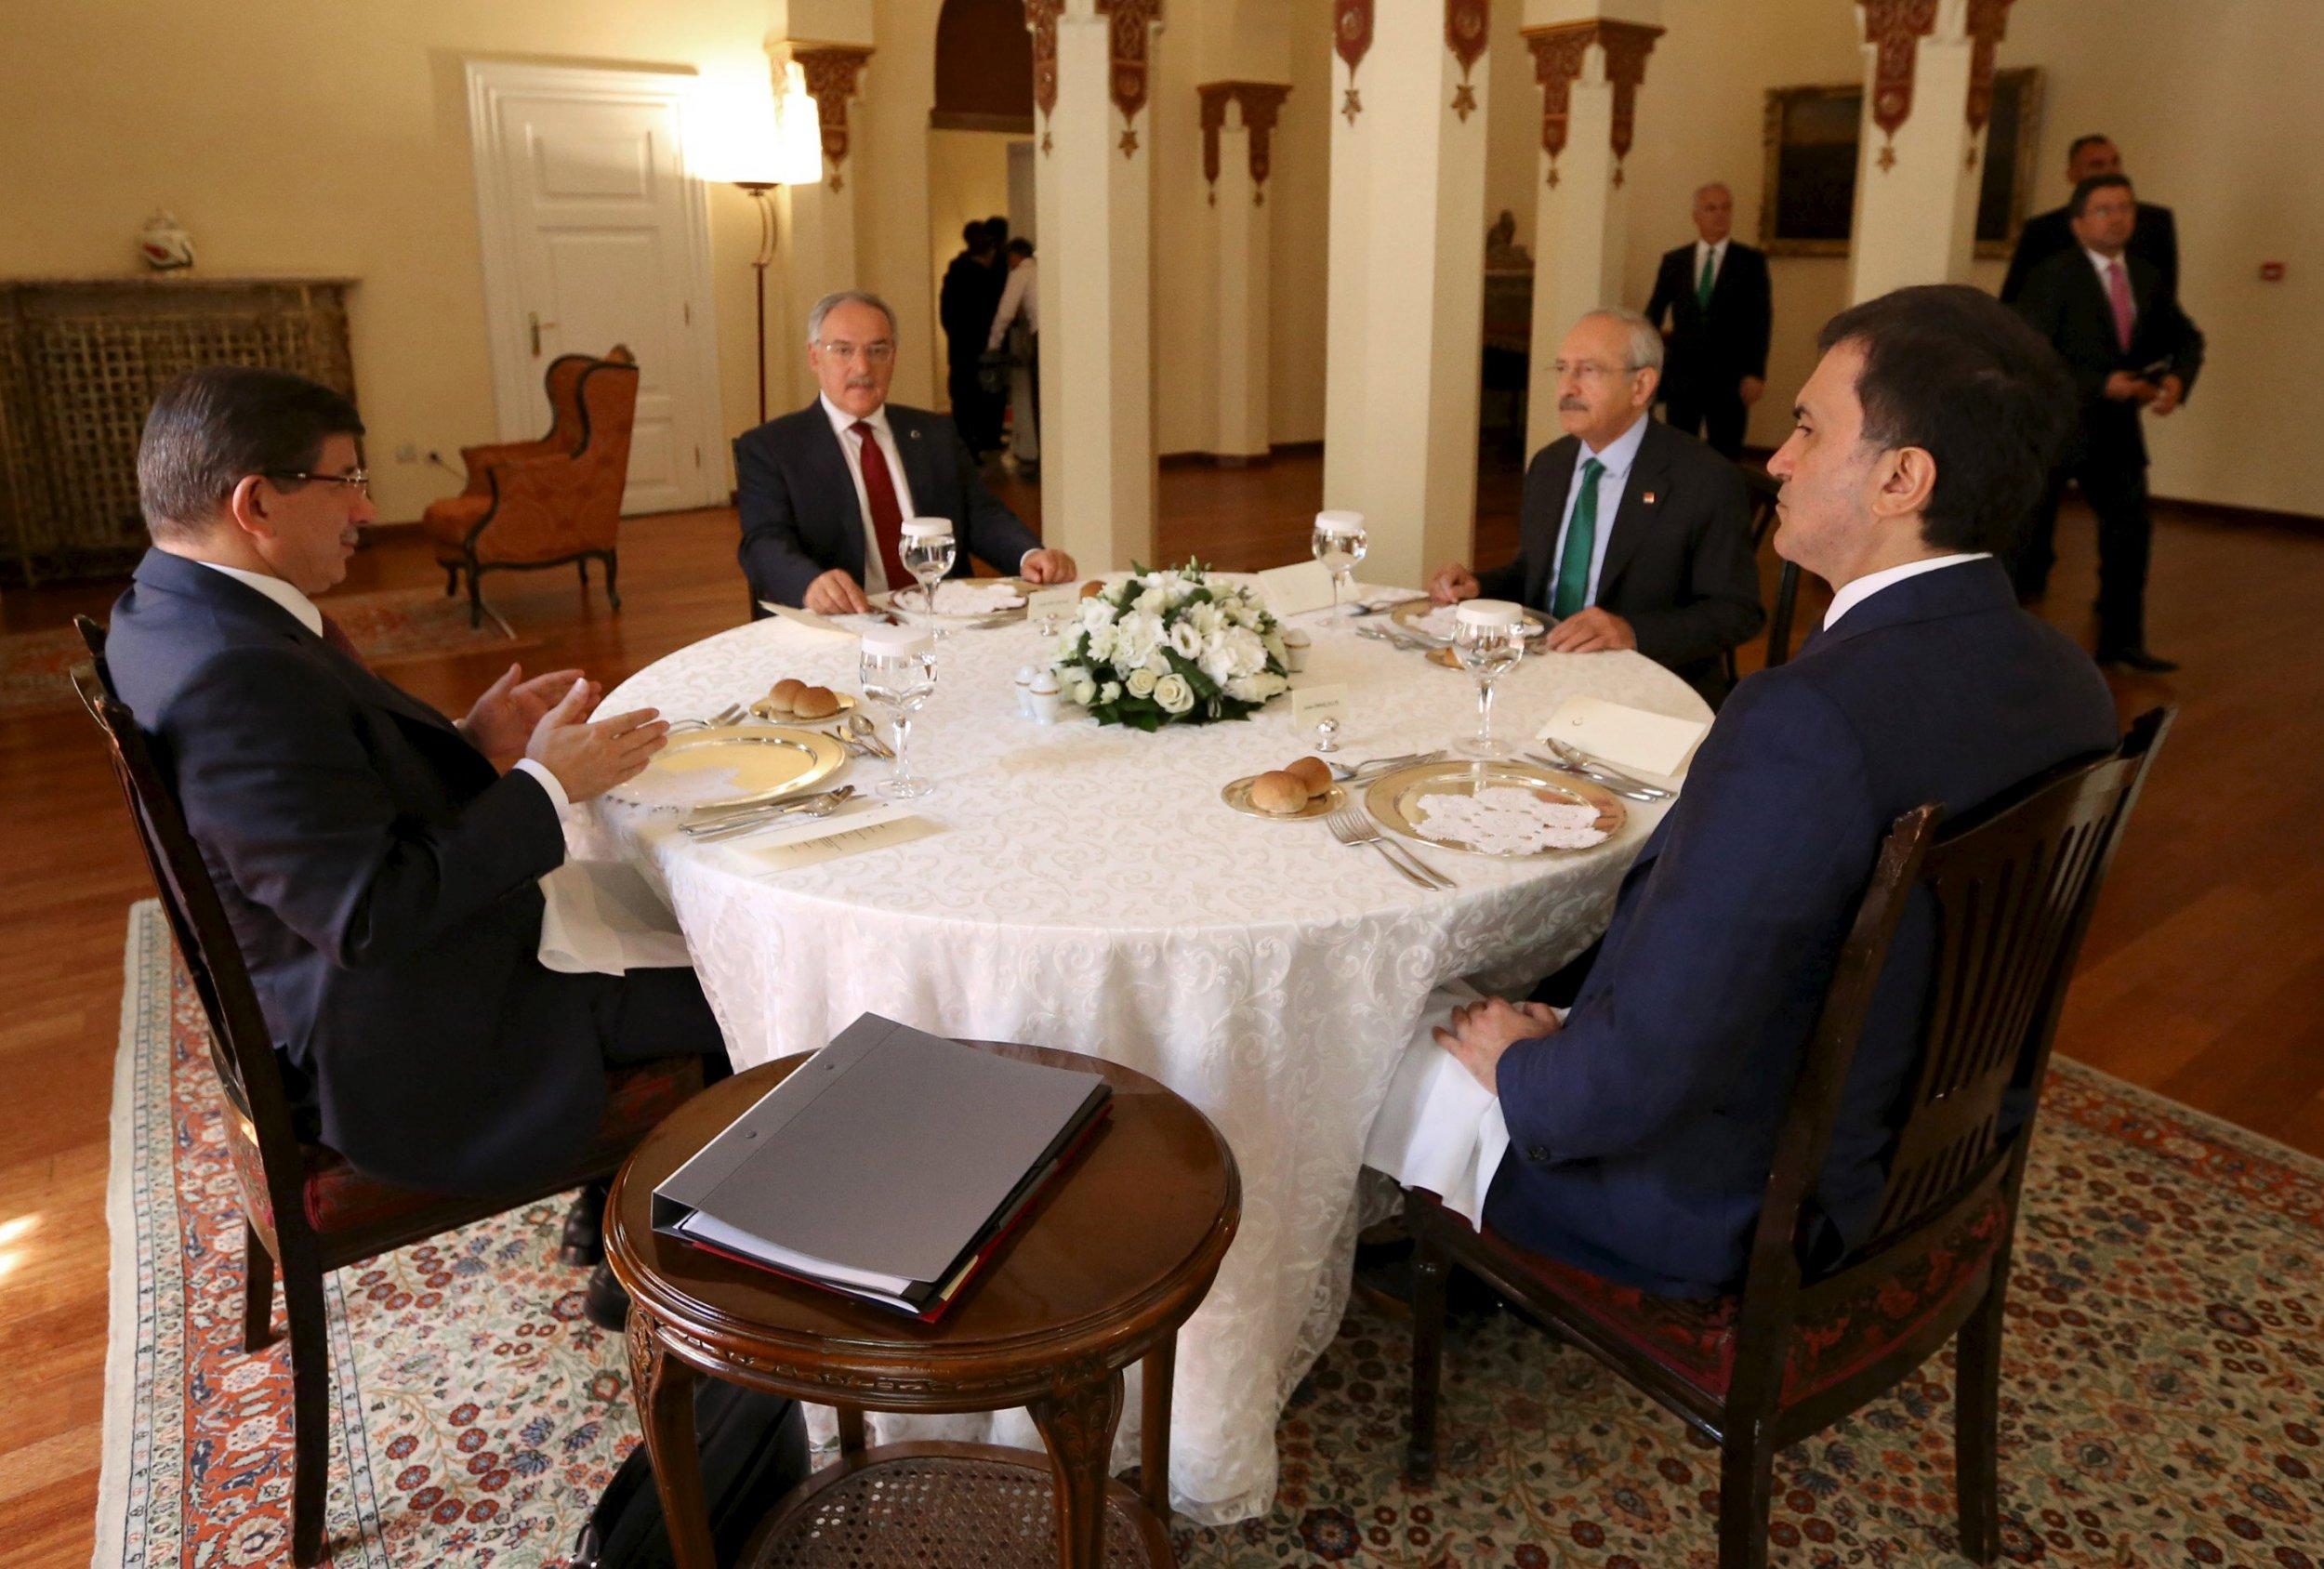 2015-08-13T194519Z_2_LYNXNPEB7C0RM_RTROPTP_4_TURKEY-POLITICS